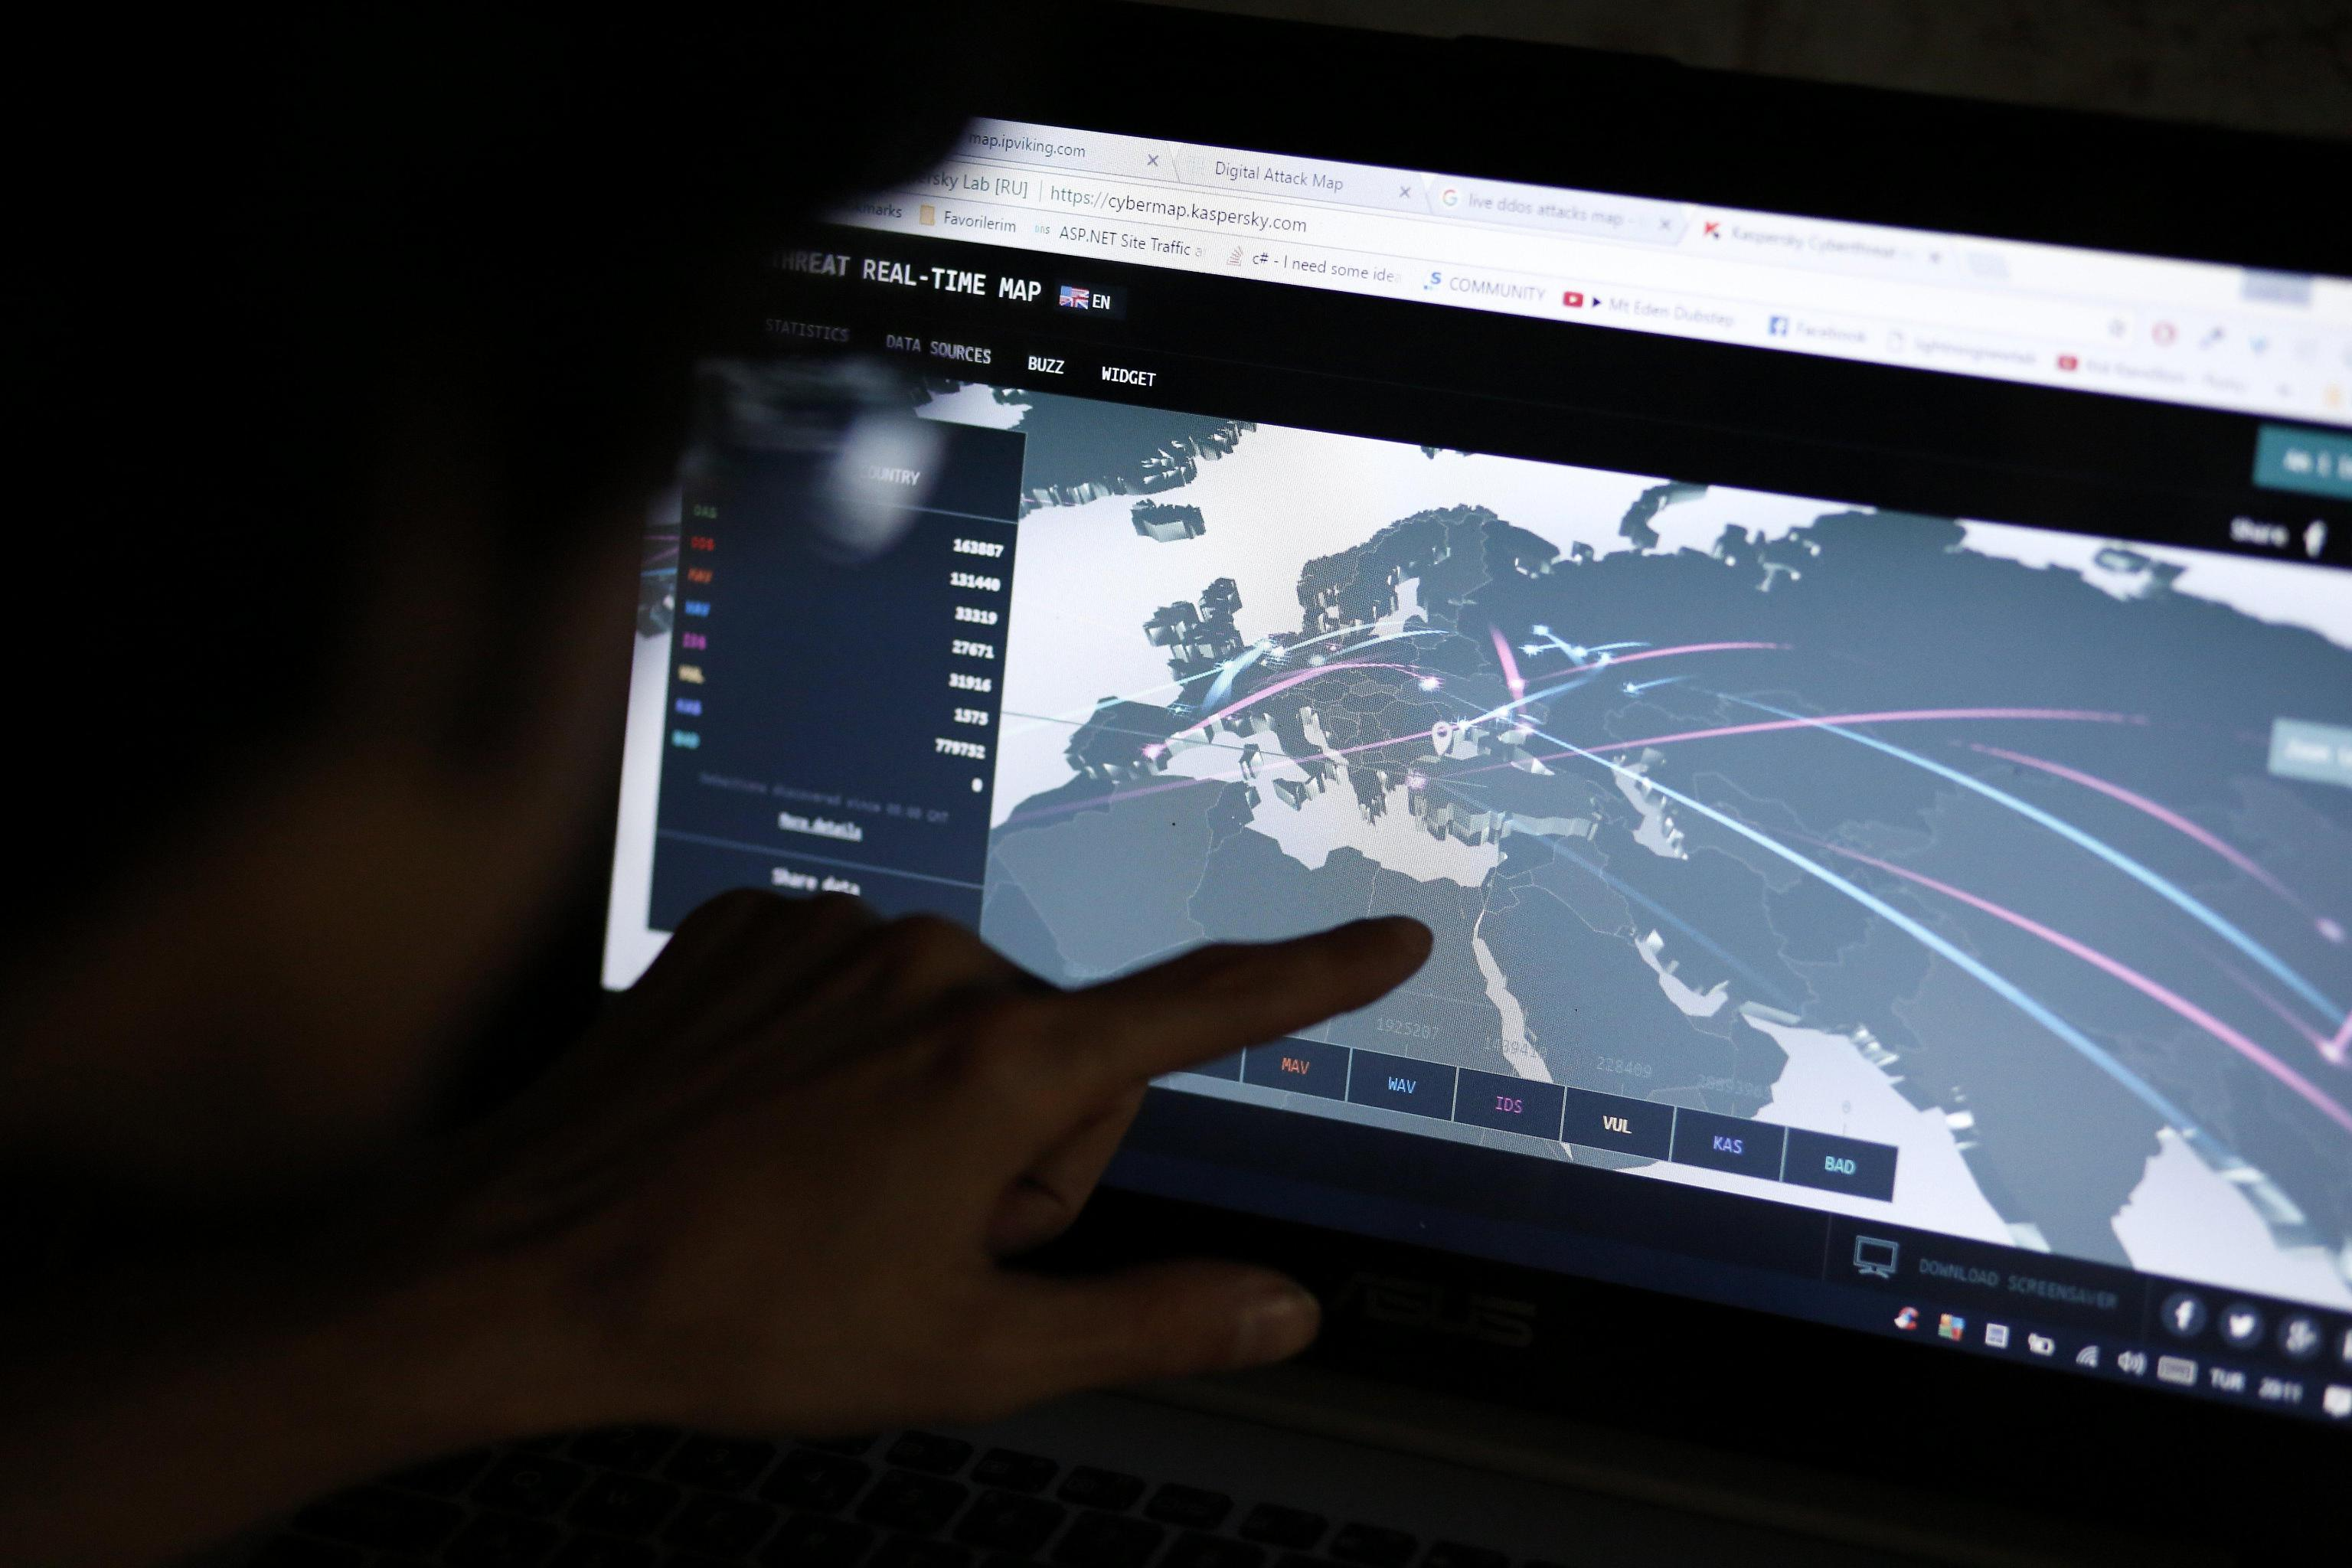 Cybersicurezza in sanità, l'esperta denuncia: dati dei malati appetibili per gli hacker